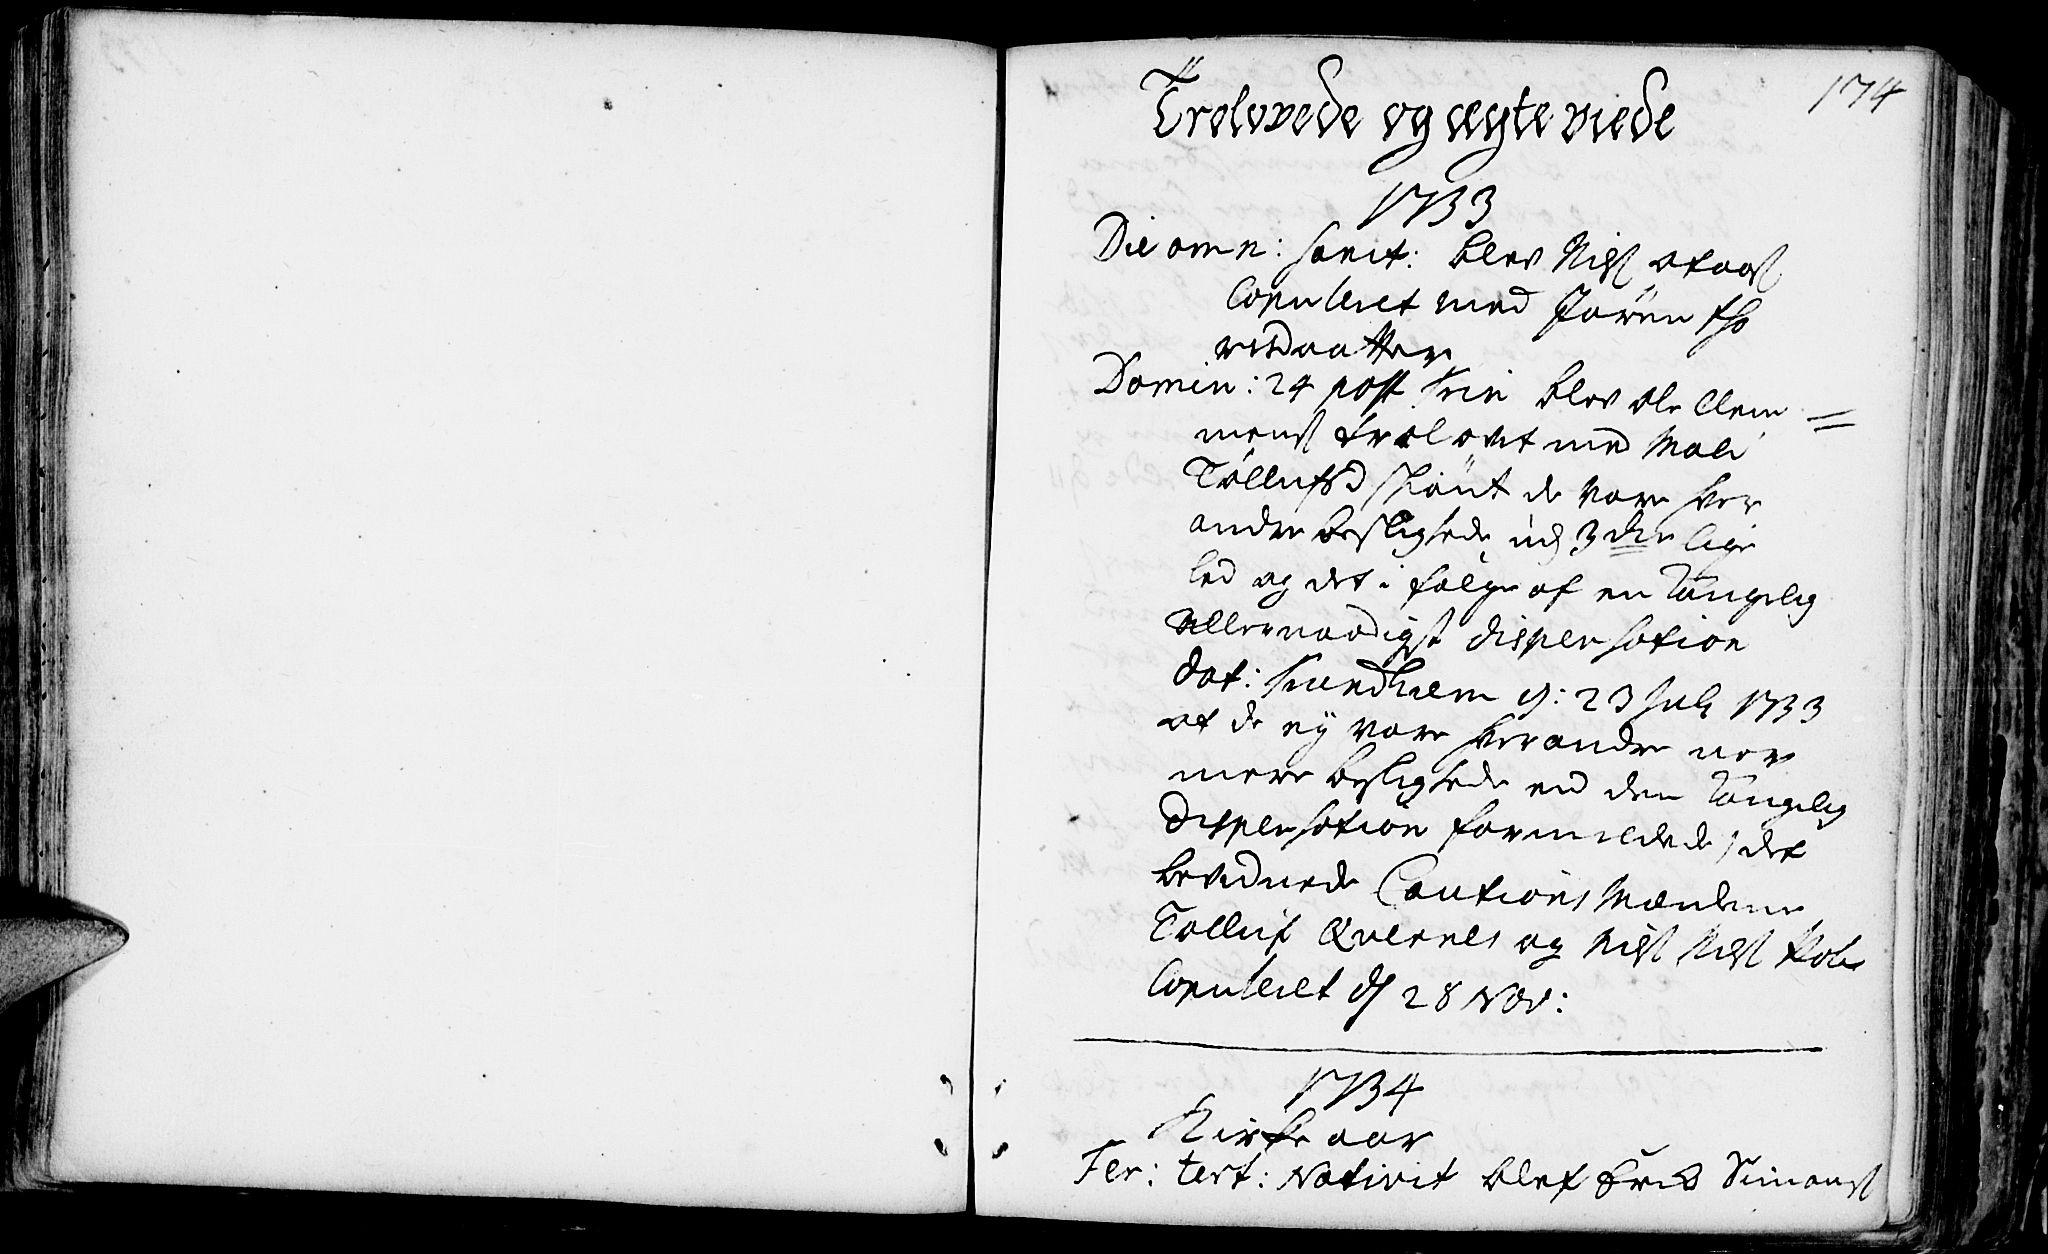 SAH, Rendalen prestekontor, H/Ha/Haa/L0001: Ministerialbok nr. 1, 1733-1787, s. 174